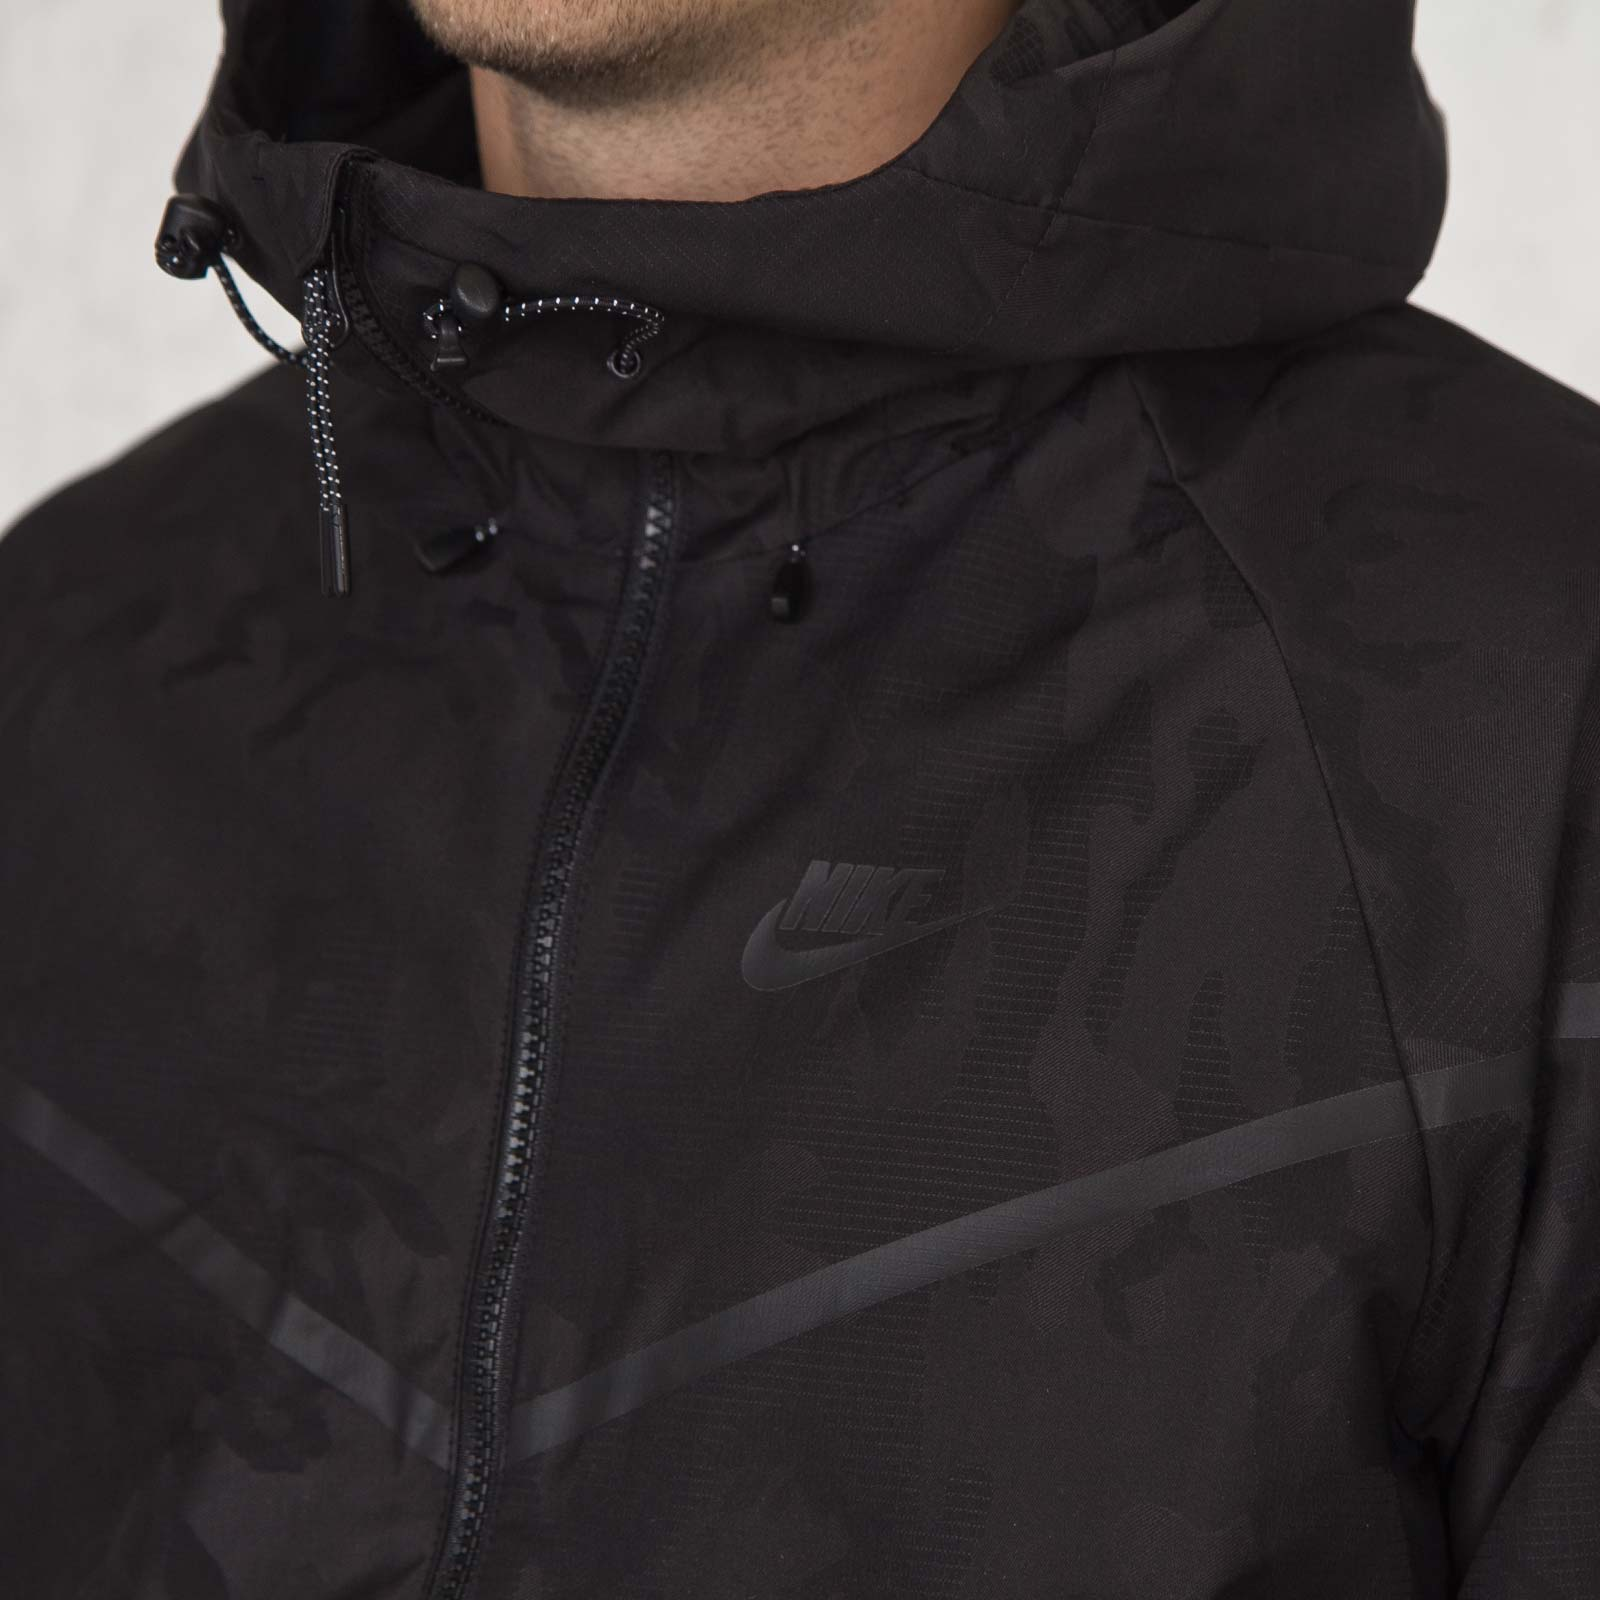 b0c86be7beea Nike Bonded Woven Windrunner - Camo - 678635-010 - Sneakersnstuff ...